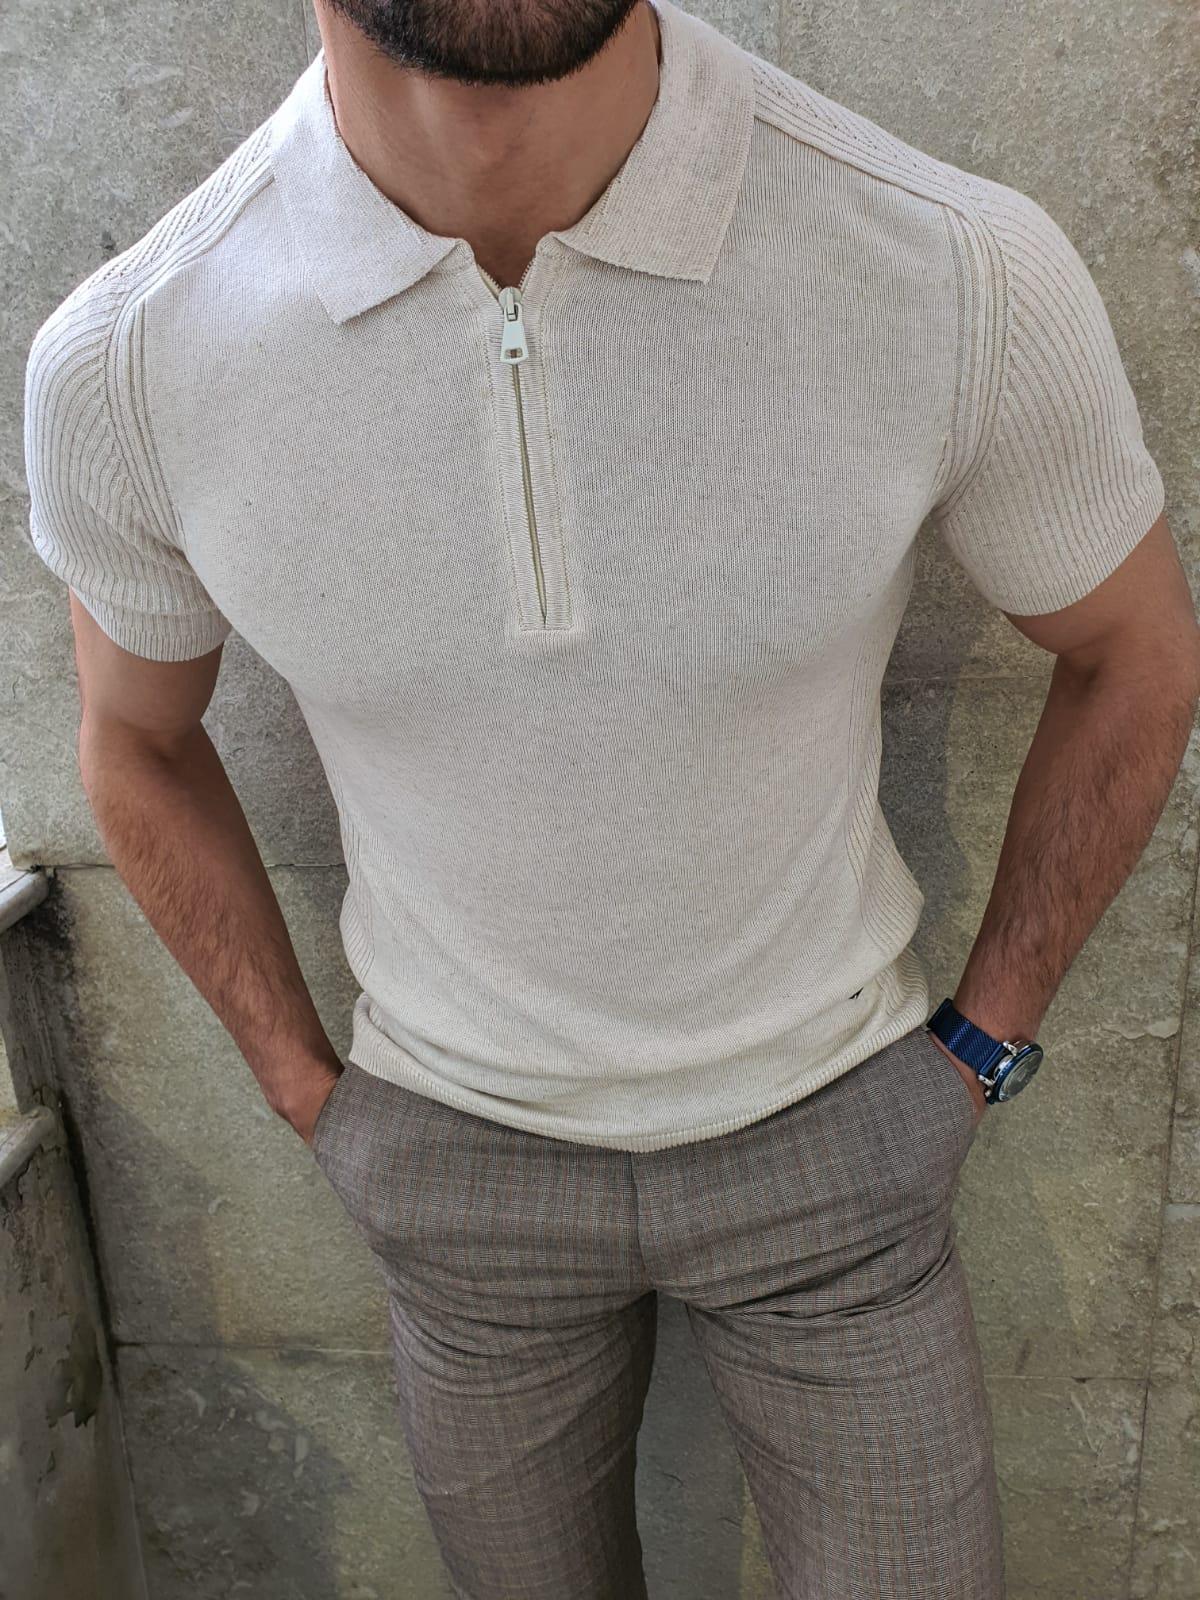 Aysoti White Slim Fit Collar Neck Zipper Knitwear T-Shirt